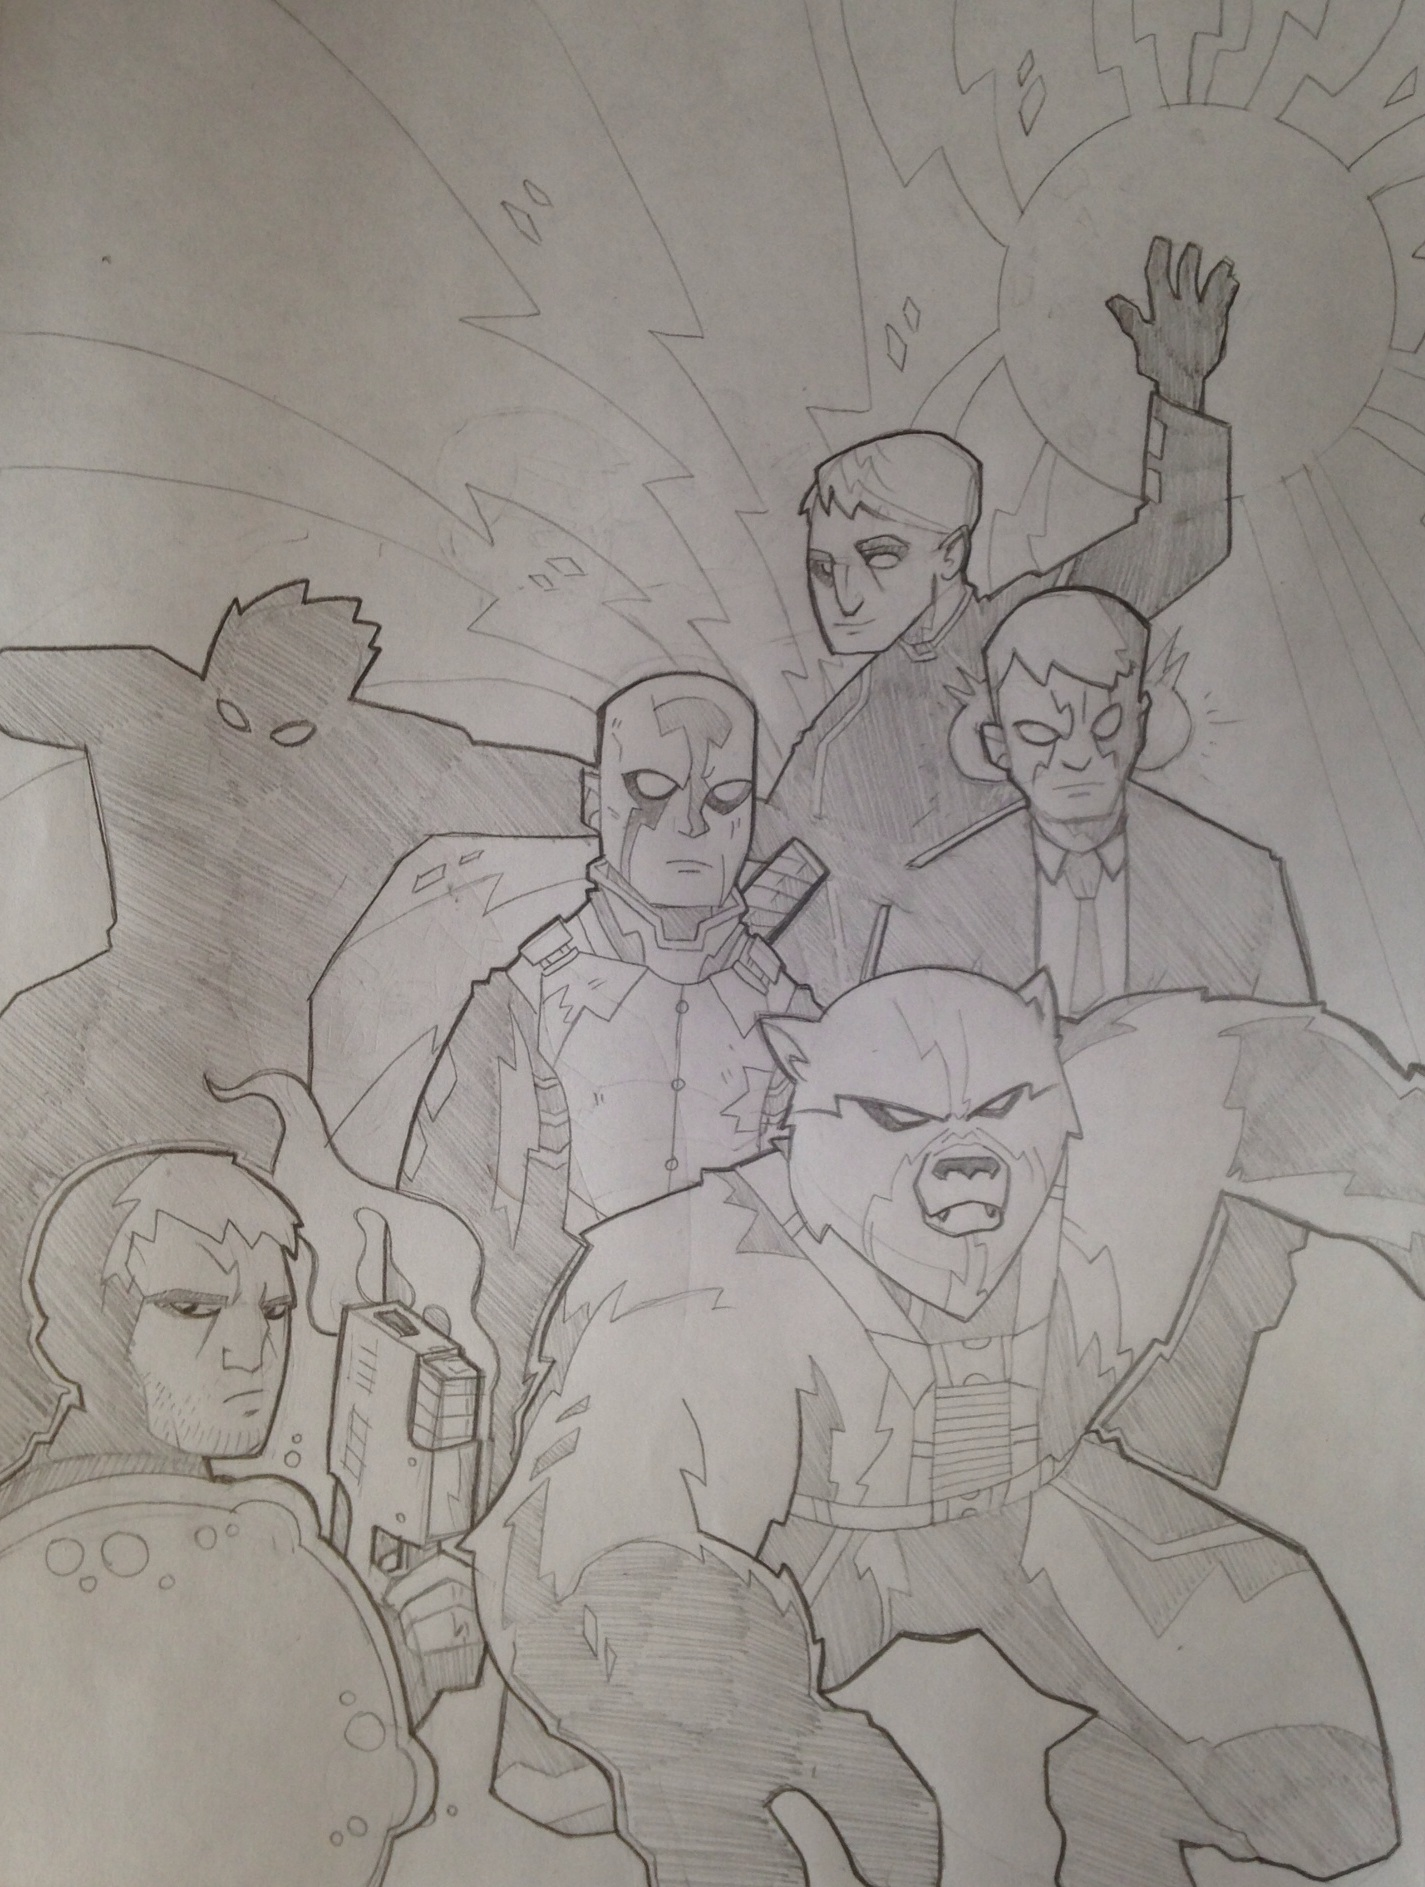 Original pencil drawing.